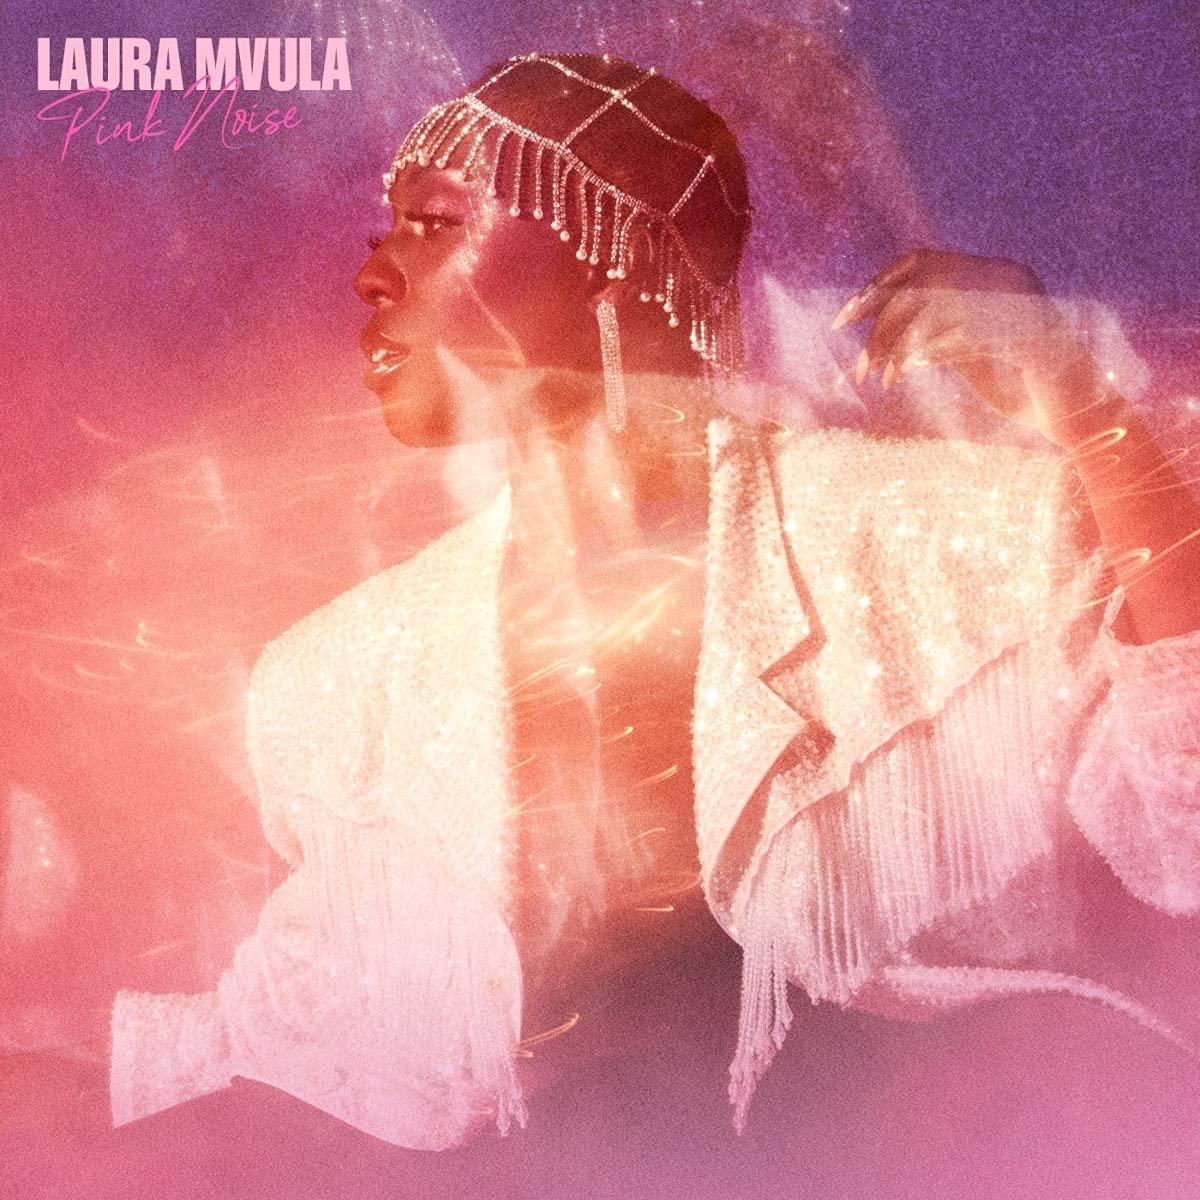 Album: Laura Mvula - Pink Noise